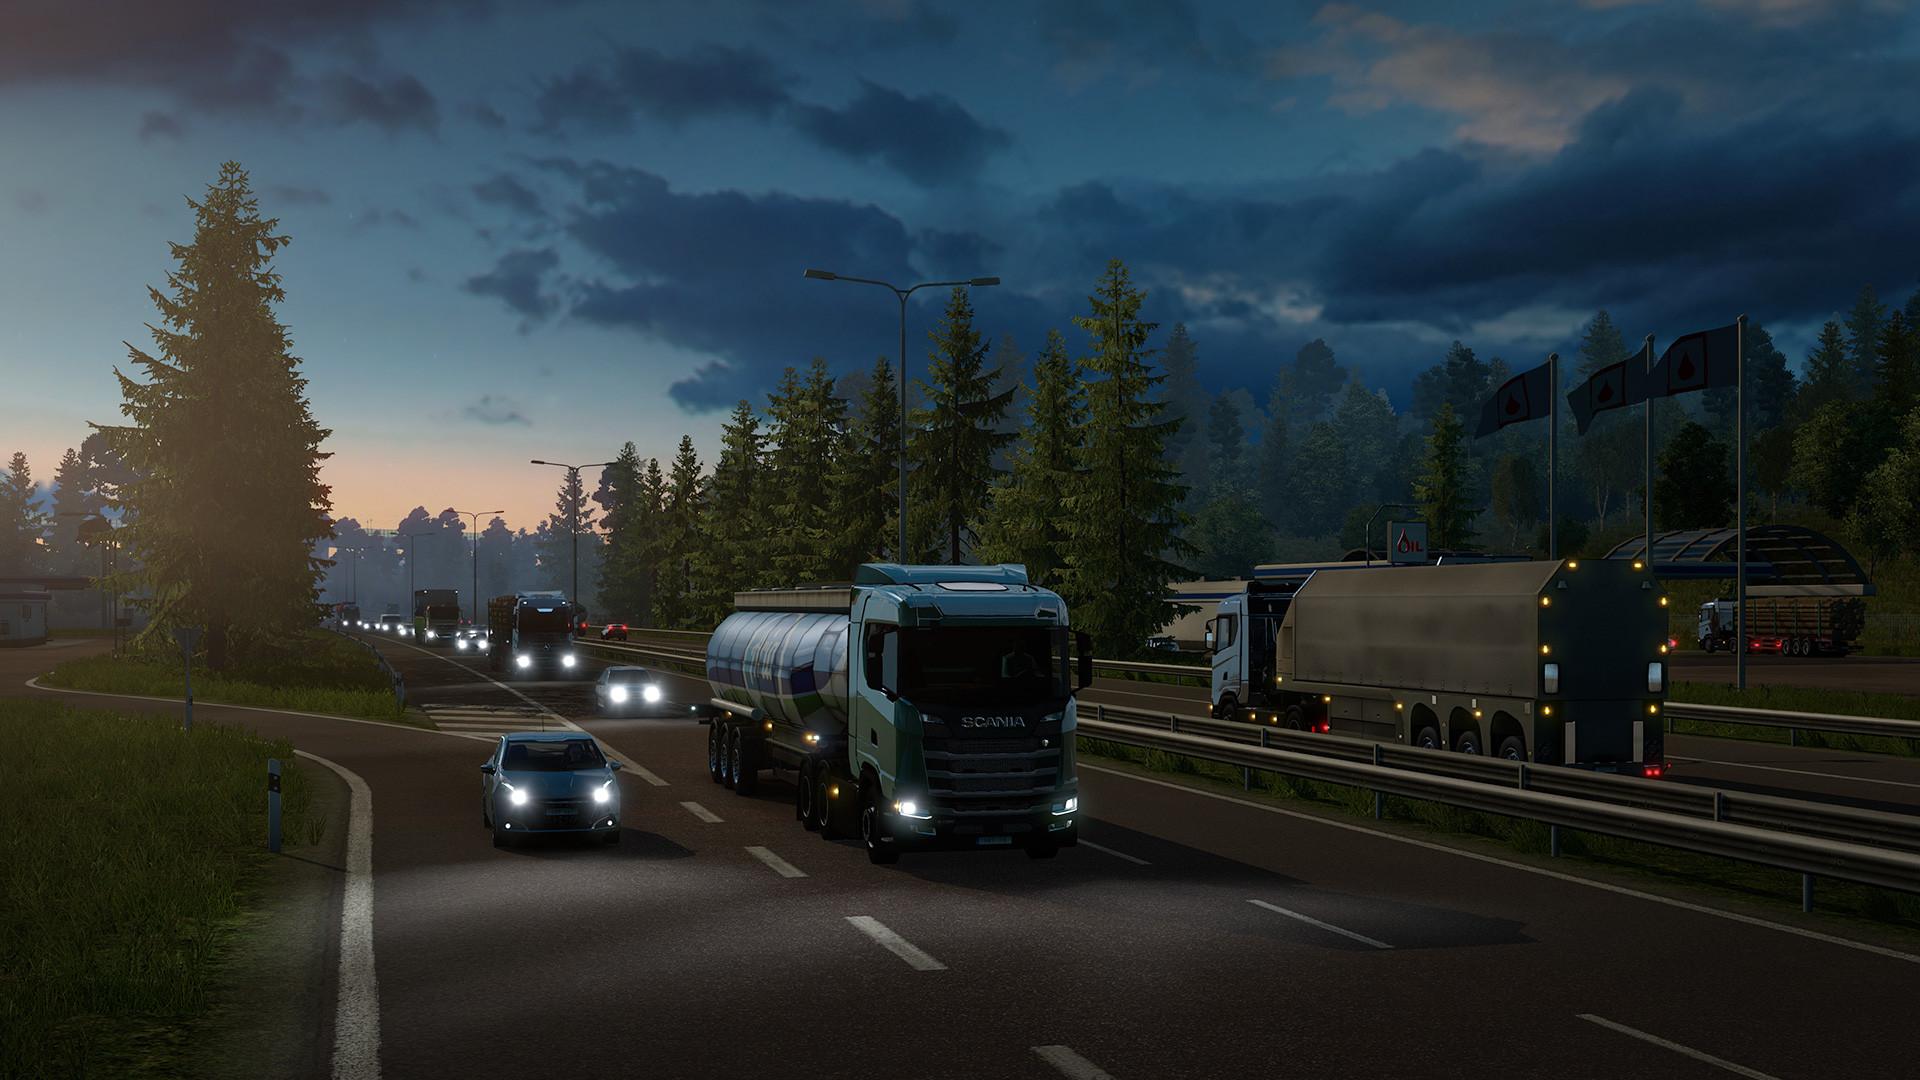 euro-truck-simulator-2-pc-screenshot-04